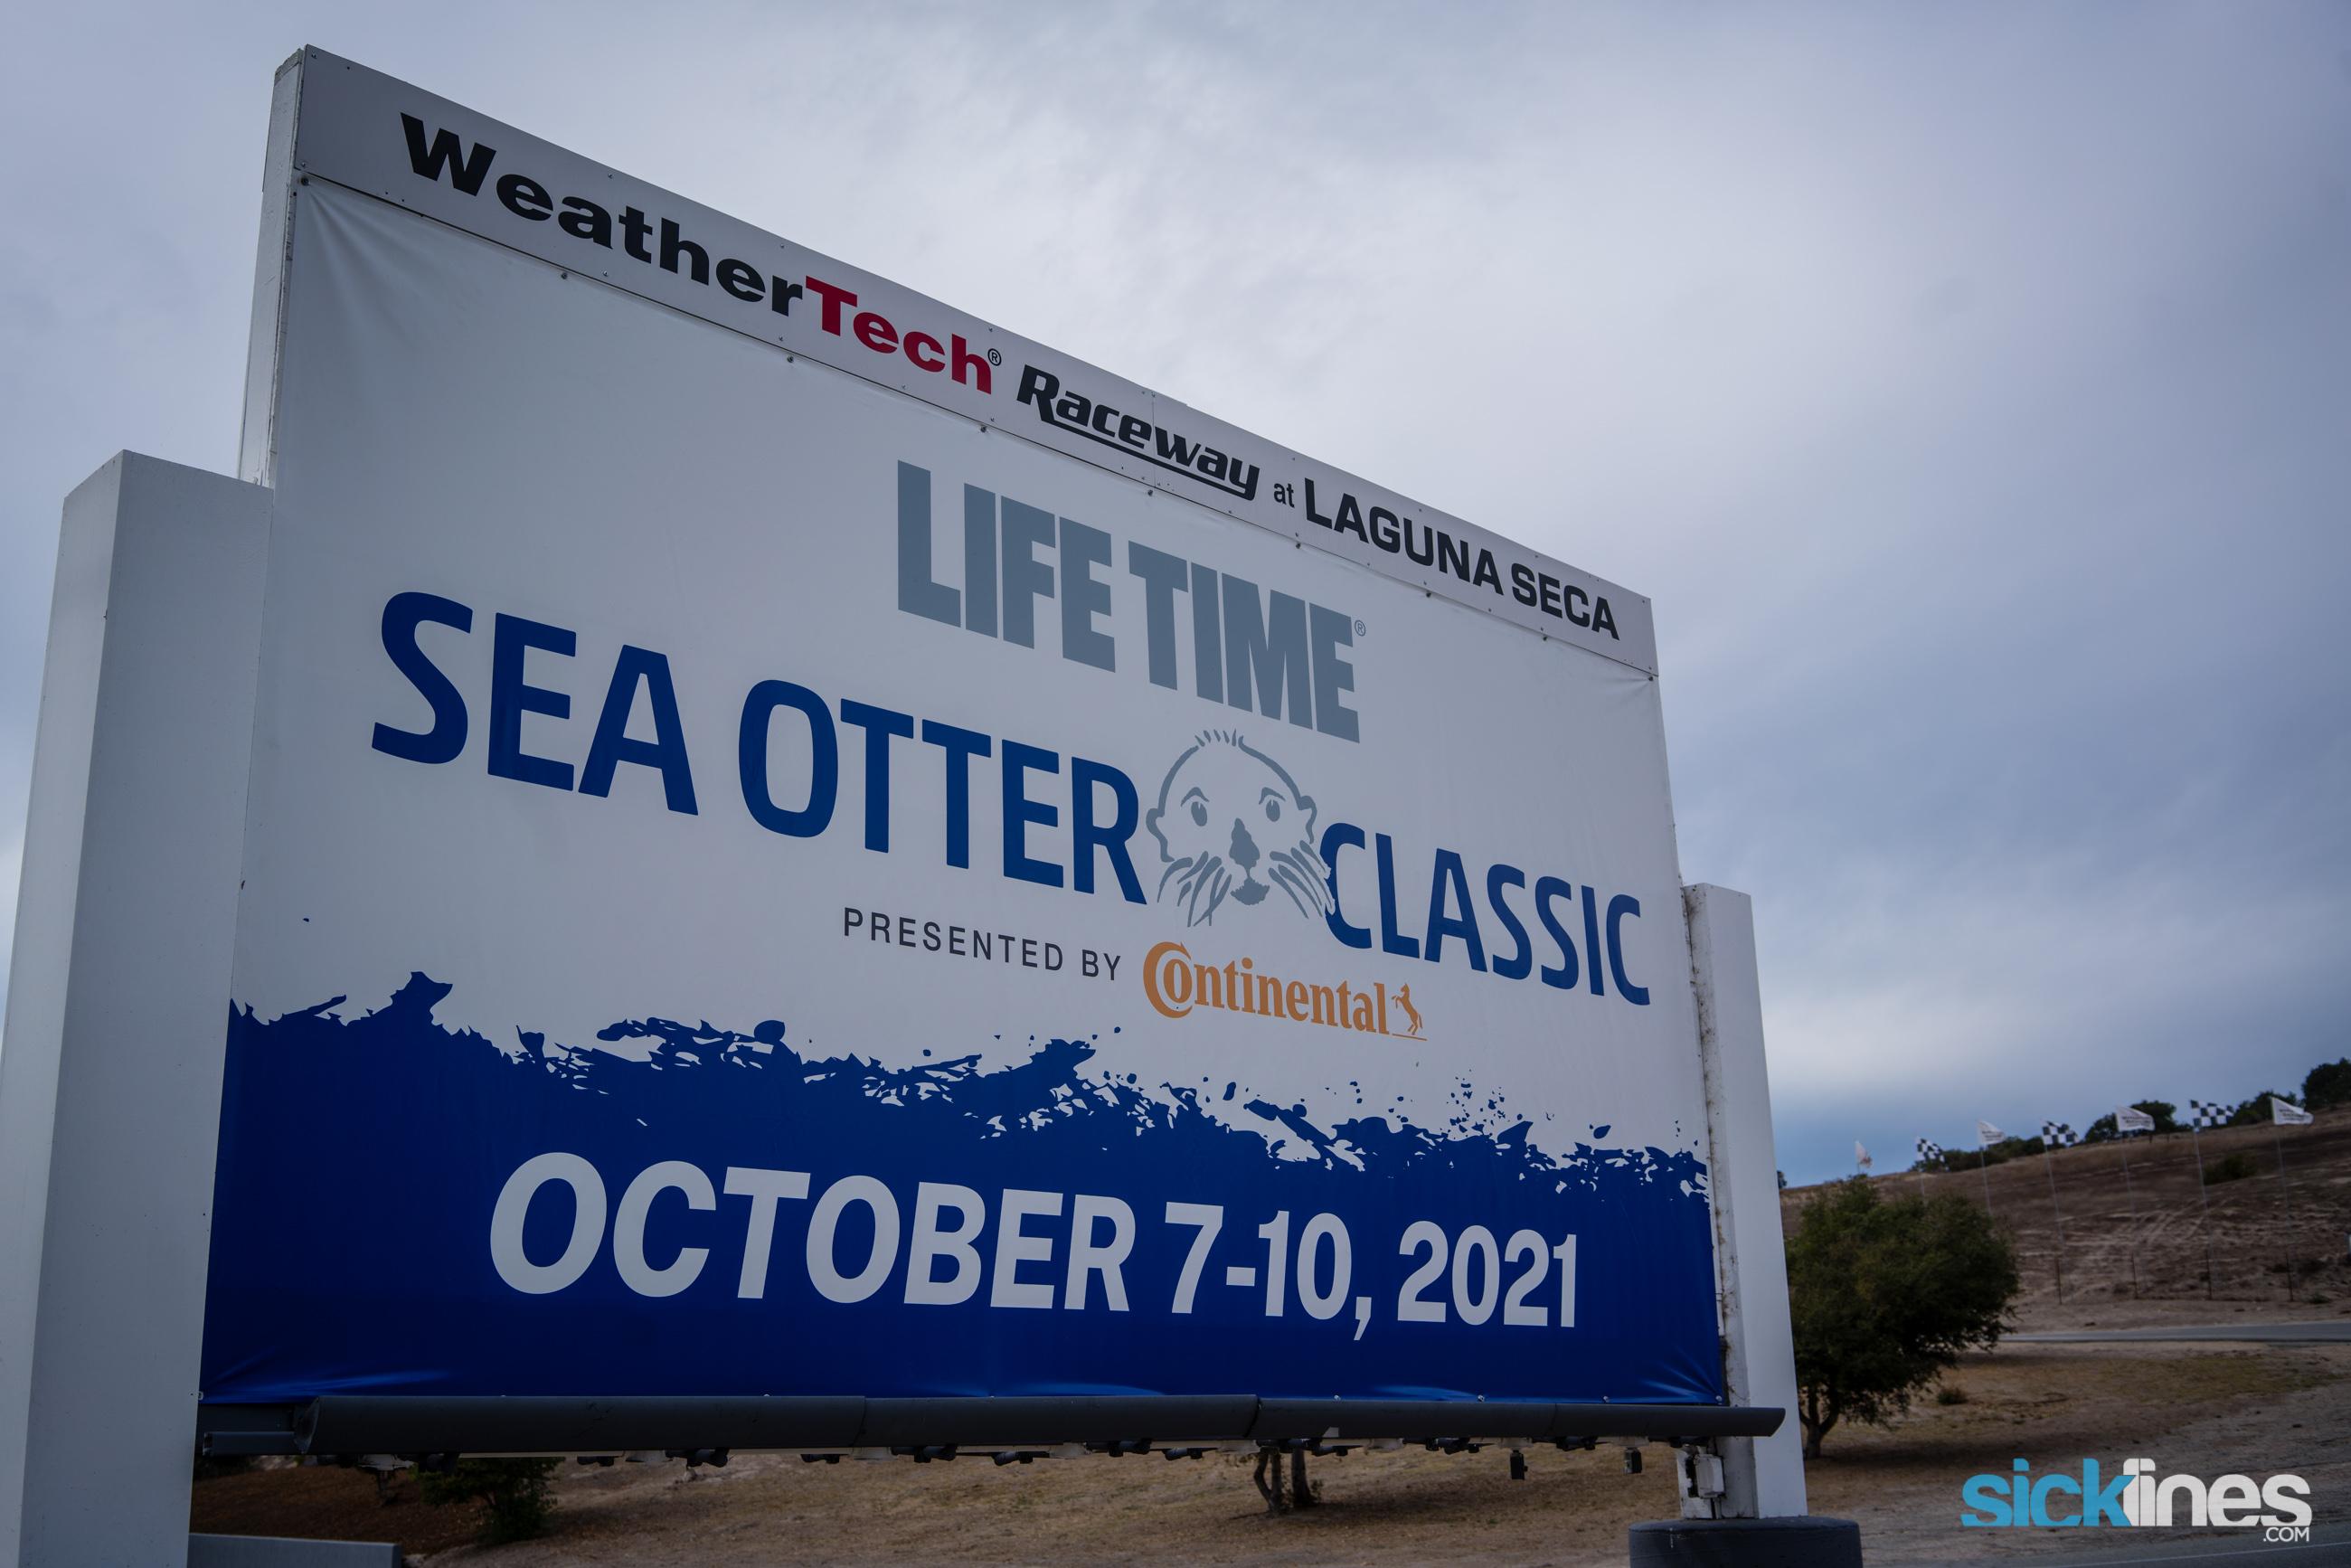 2021 Lifetime Sea Otter Classic Kicks Off October 7-10th, 2021 Lifetime Sea Otter Classic Kicks Off October 7-10th